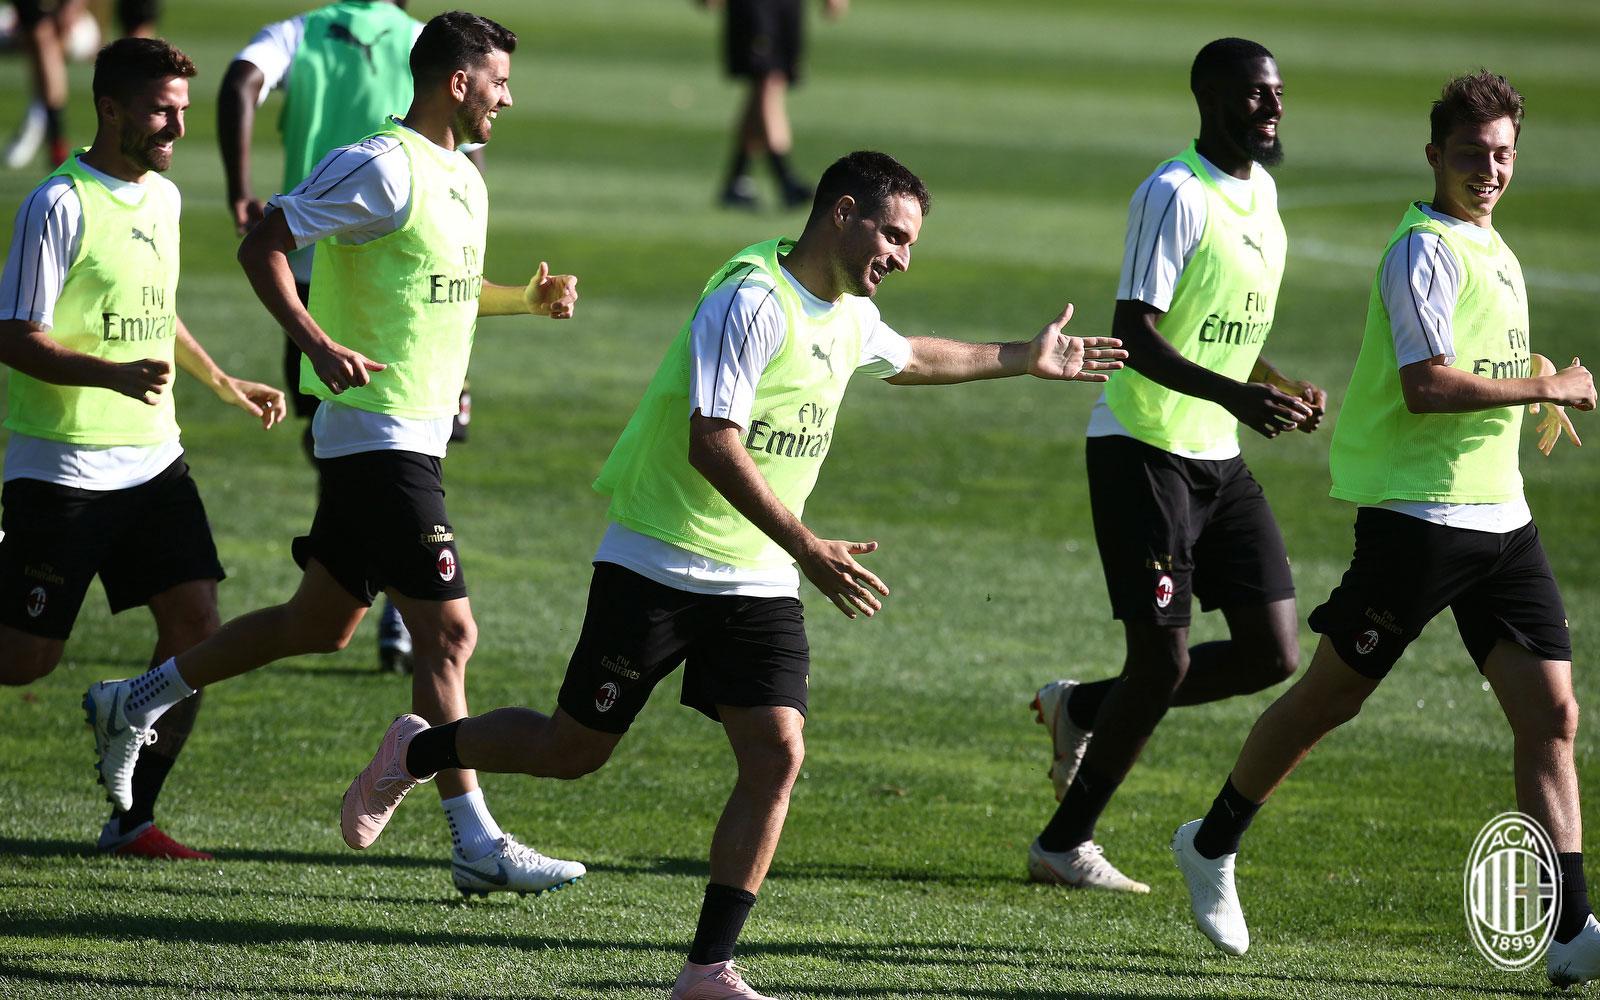 Fabio Borini, Mateo Musacchio, Giacomo Bonaventura and Tiémoué Bakayoko during training at Milanello. (@acmilan.com)